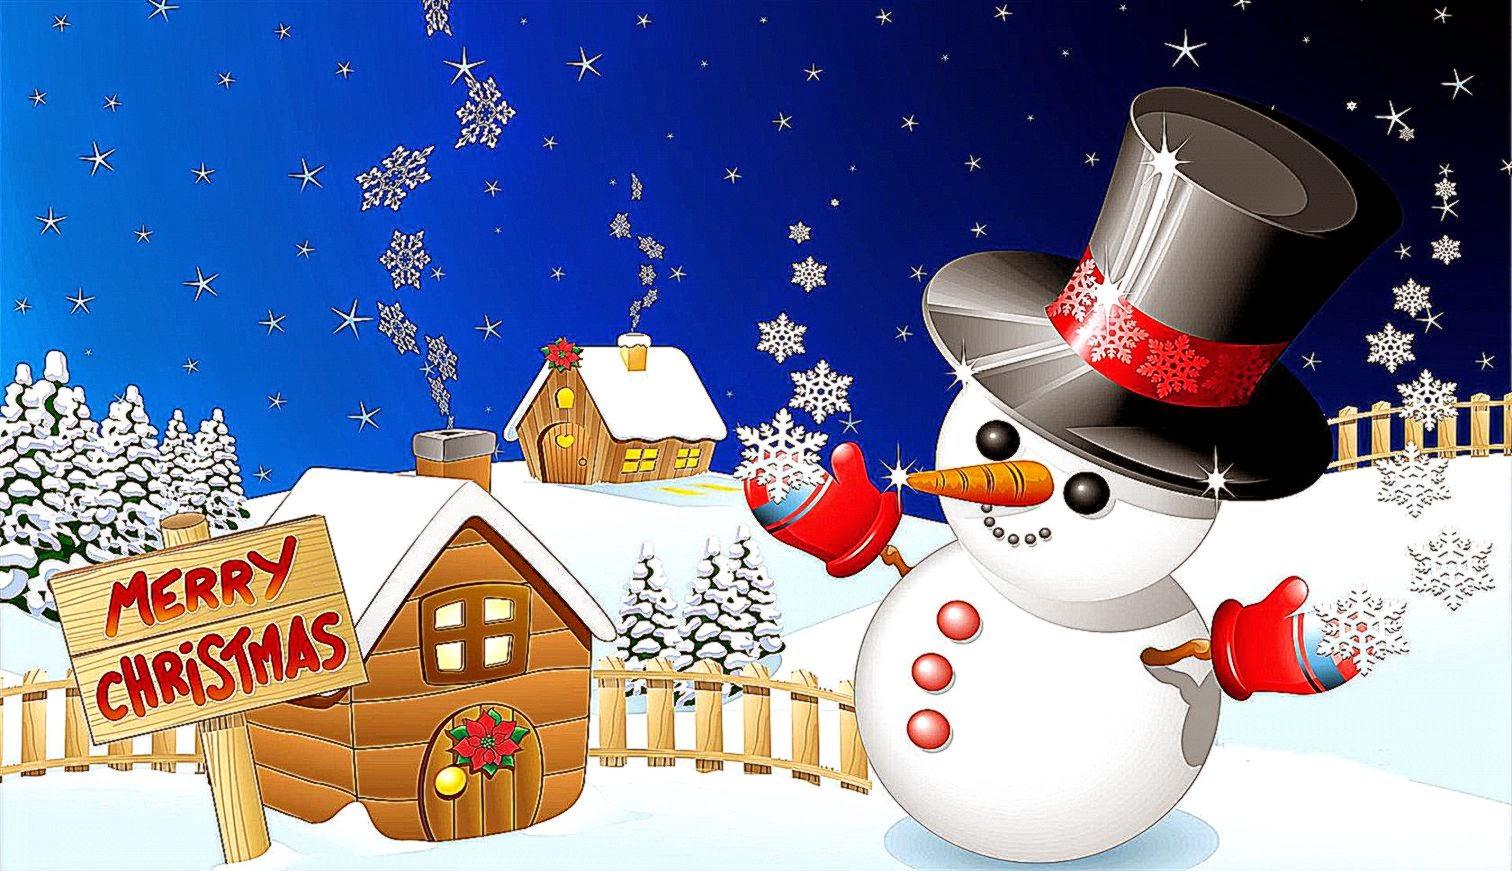 Cute Snowman Christmas Wallpaper Wallpapers Gallery 1512x871